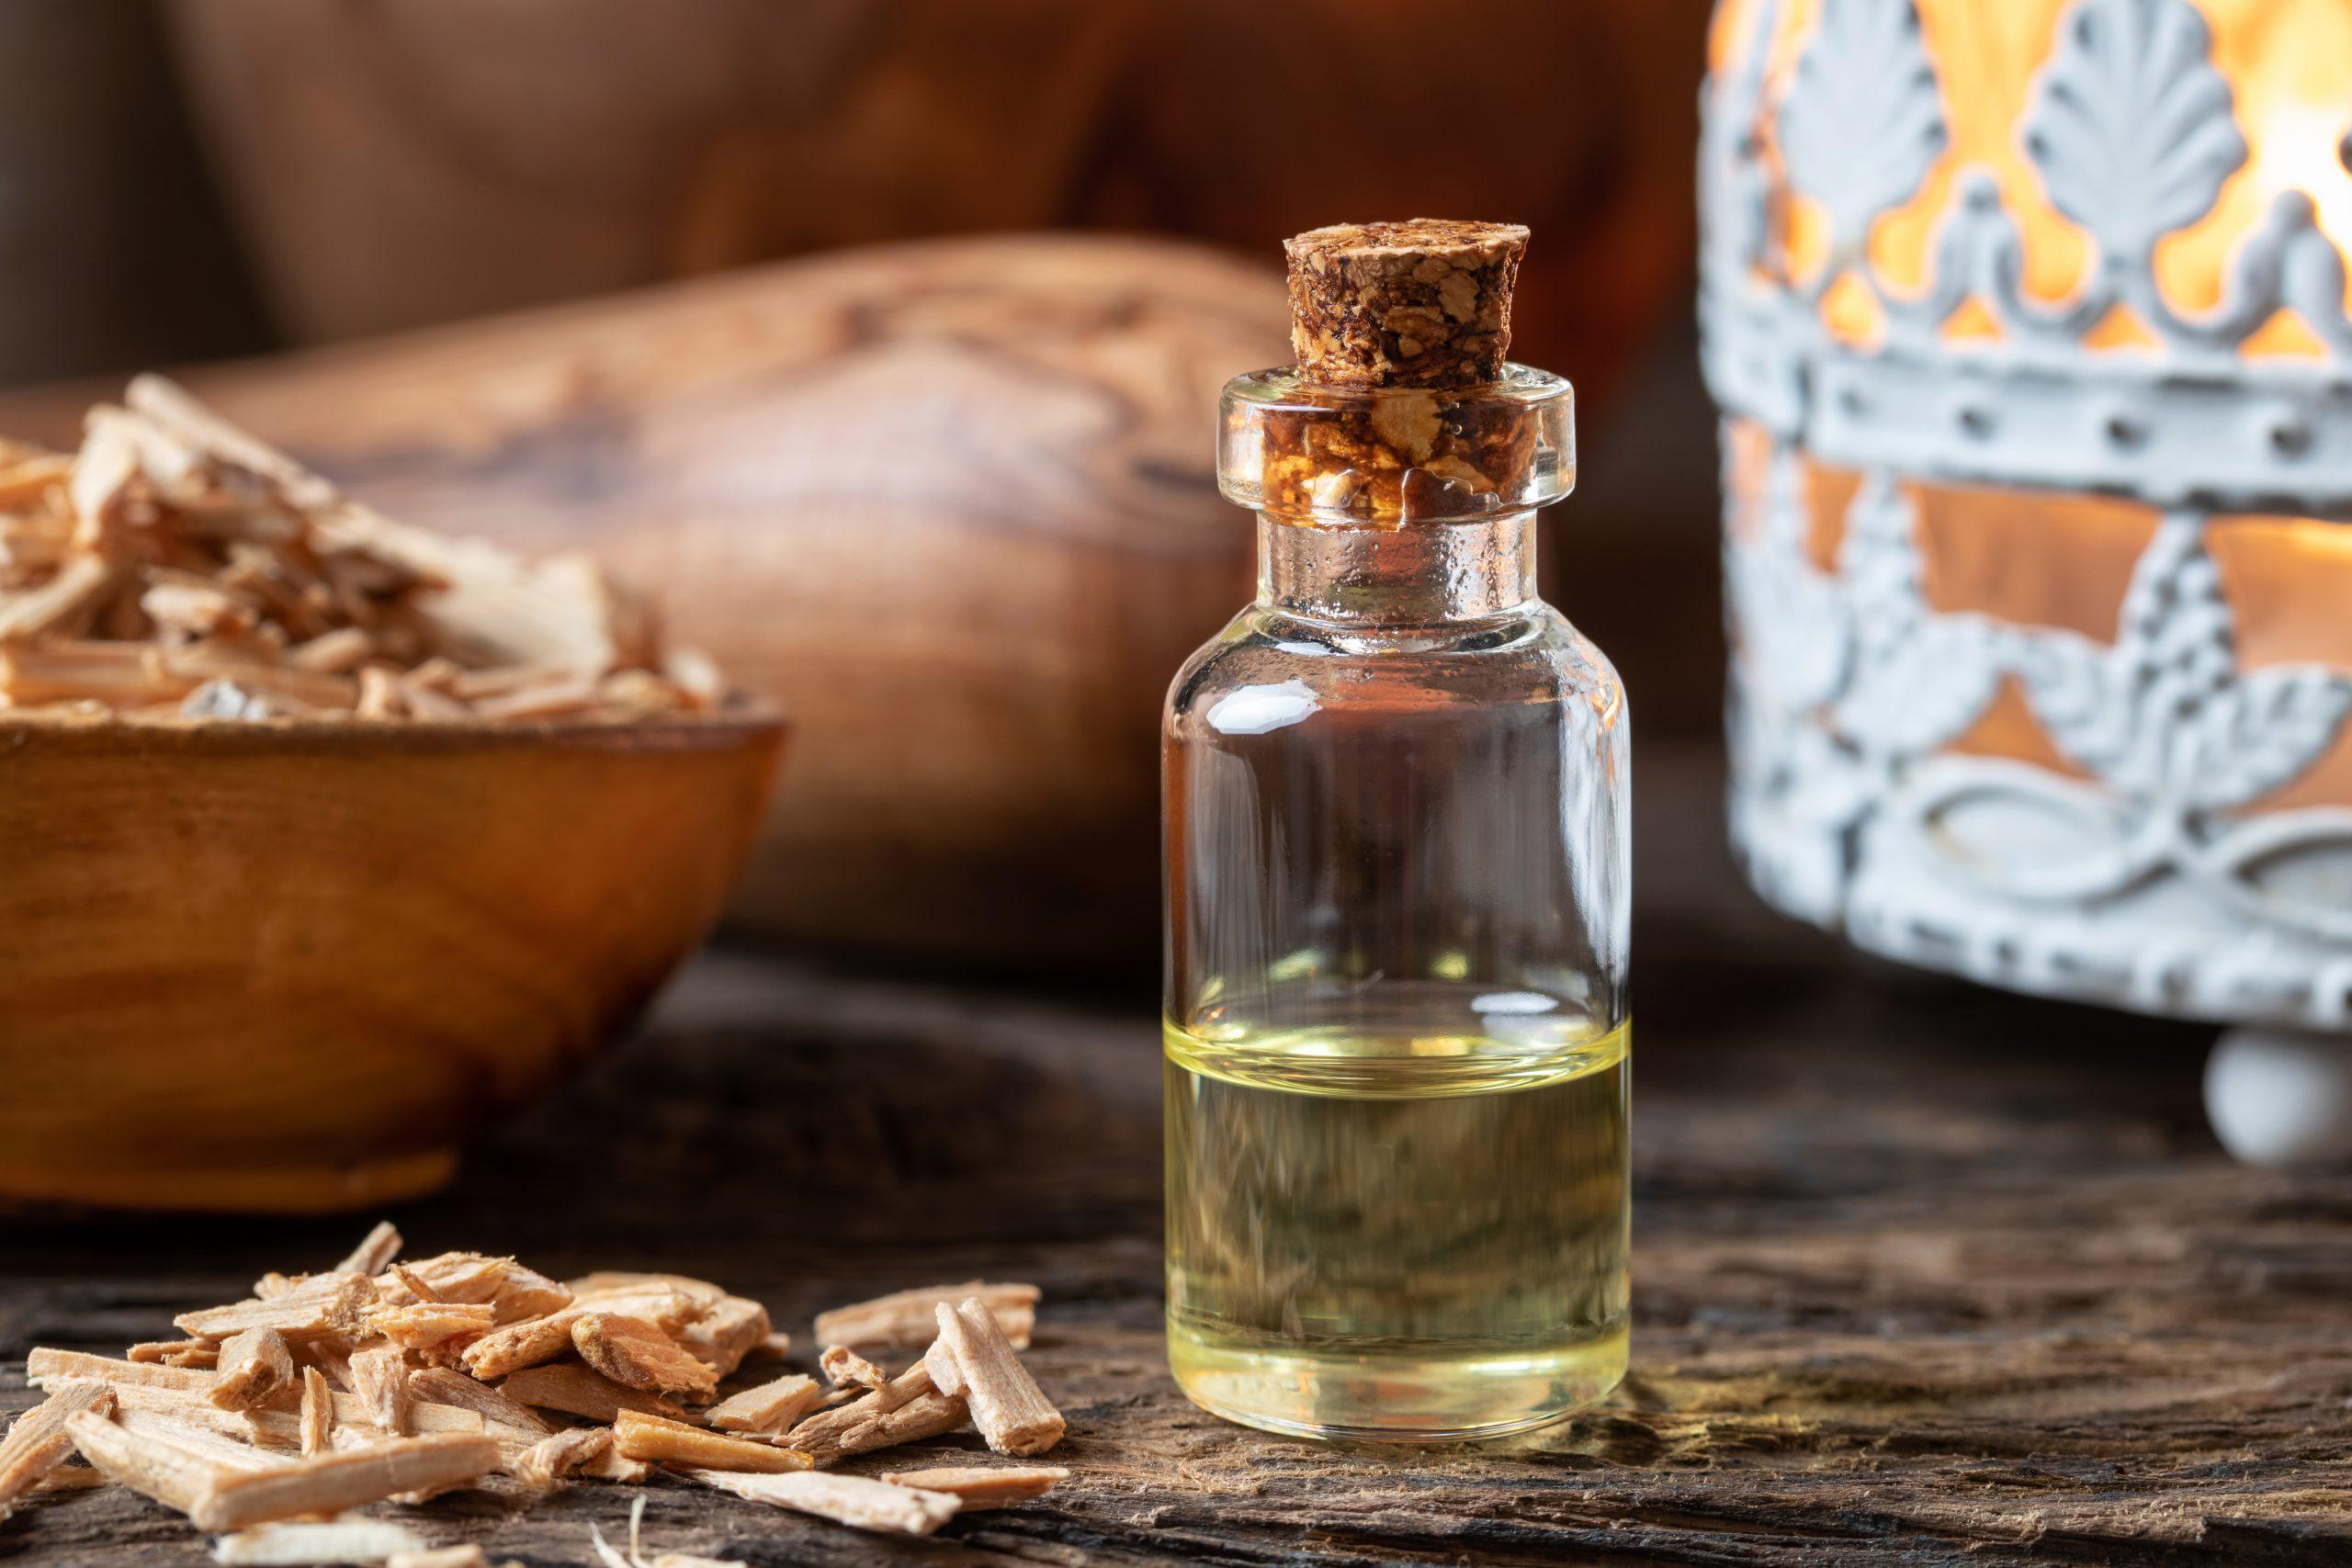 Cedarwood Essential Oil Burnt Whiskey Beard Co